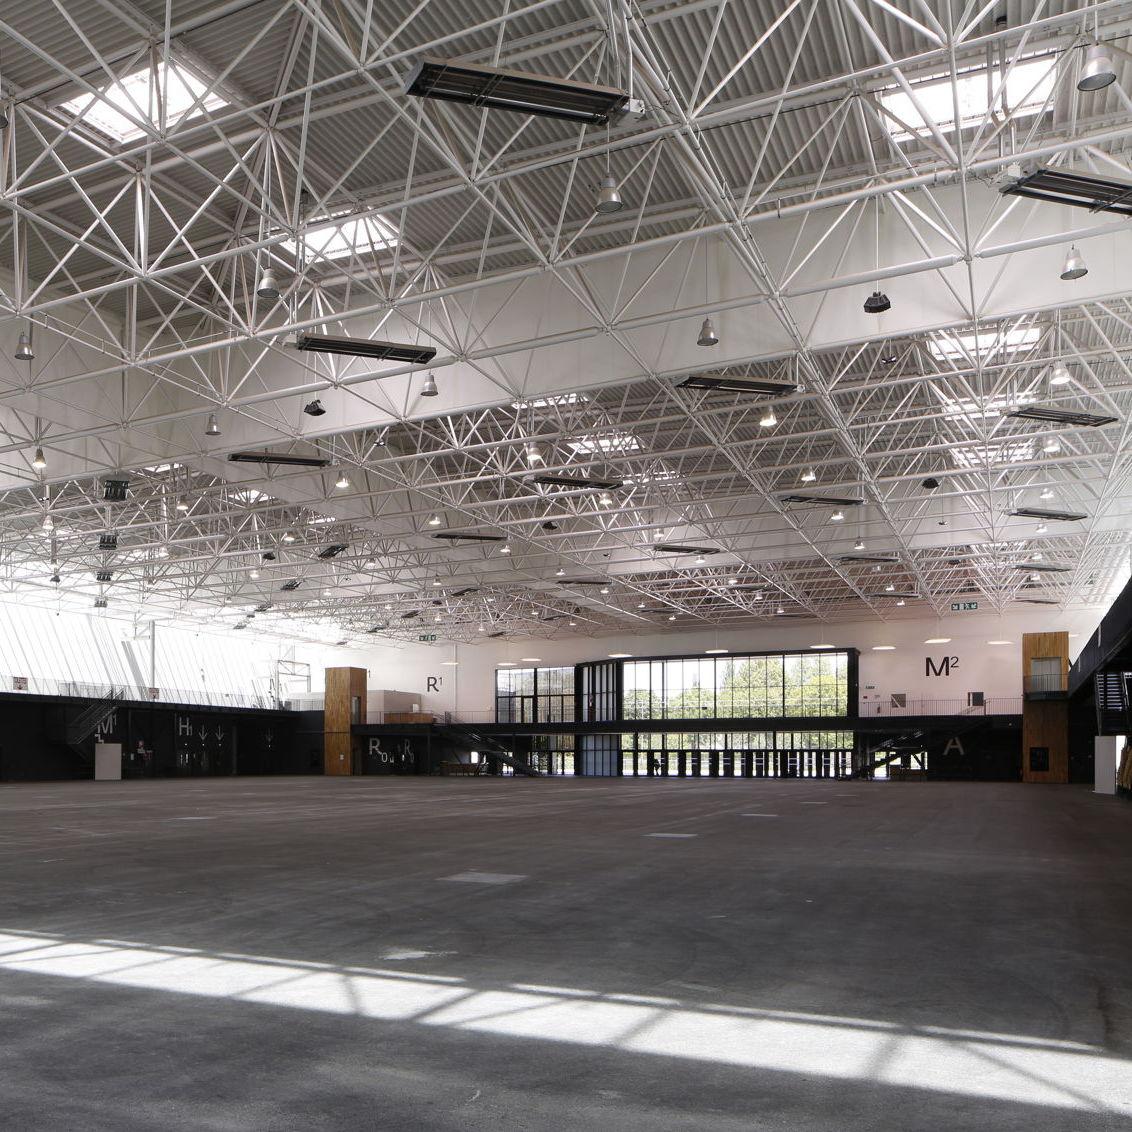 Metall-Dachstuhl / für Bedachungen - PARC DES EXPOSITIONS - Lanik